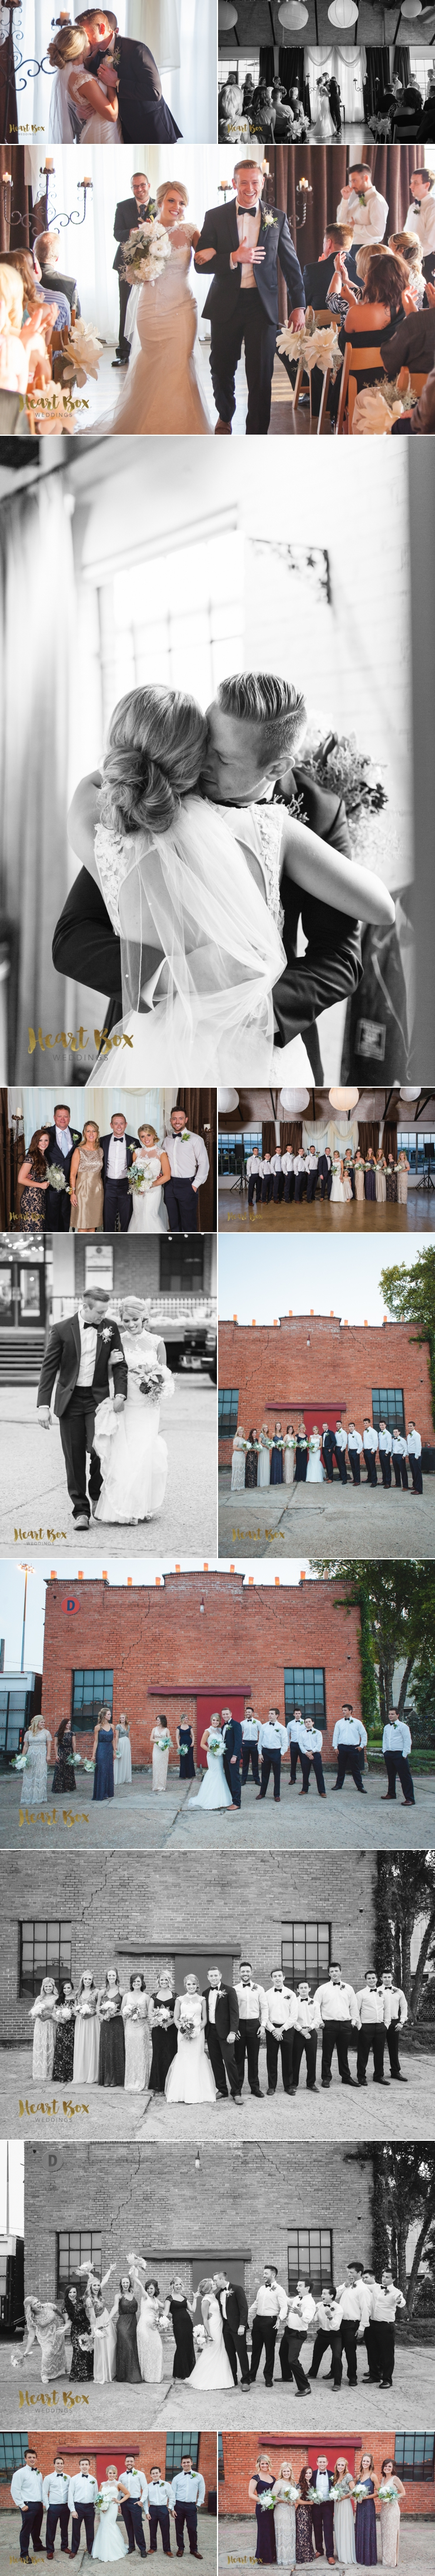 Mabry Wedding 18.jpg